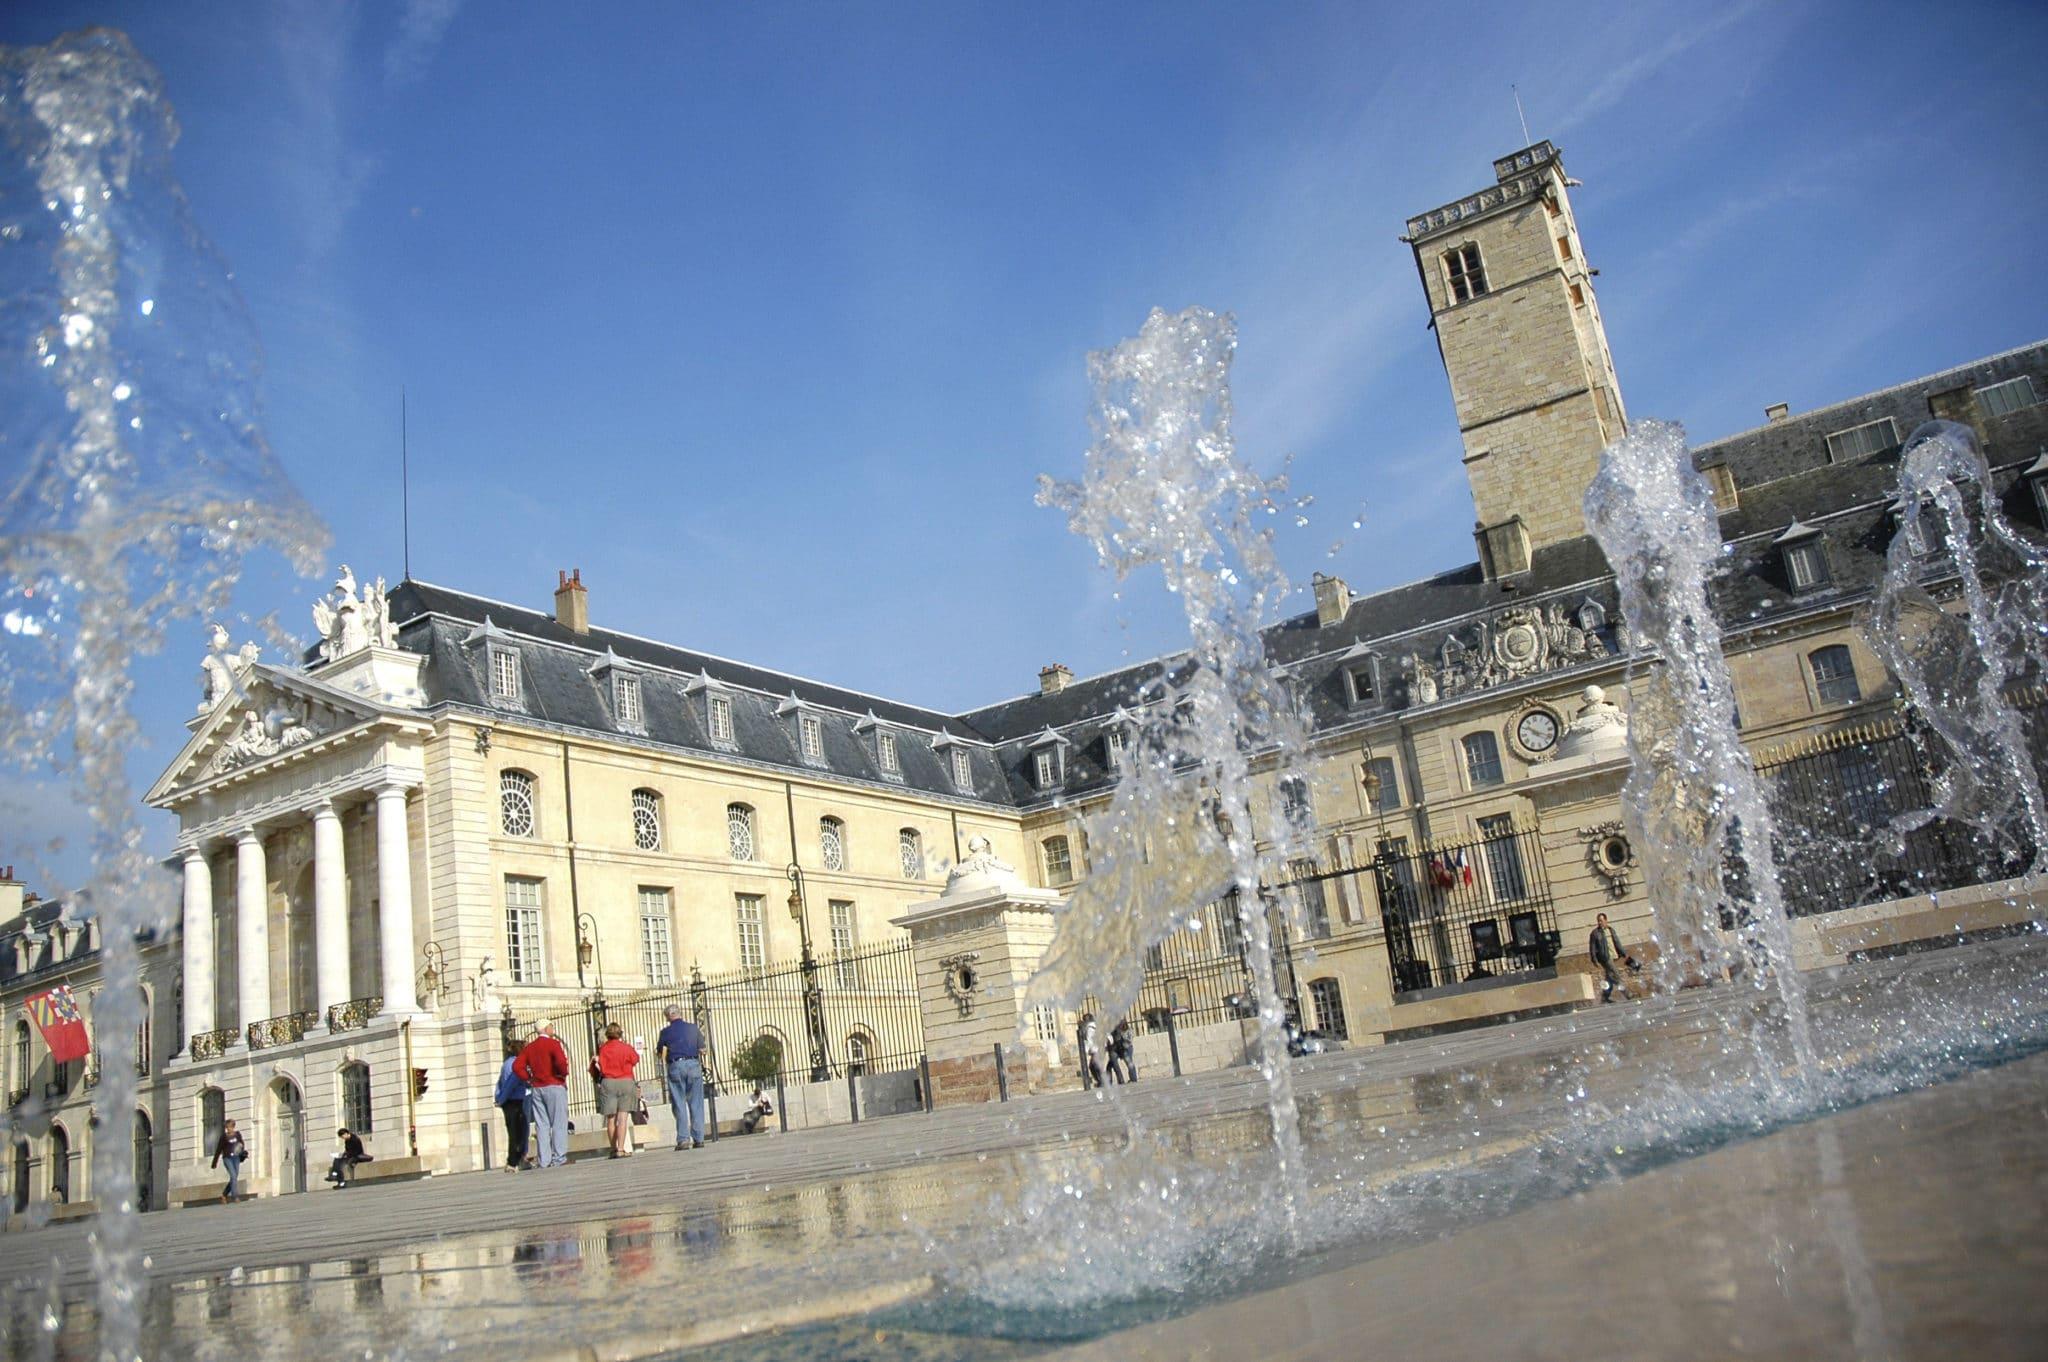 Place de la Libération Dijon ©atelierdemoulin